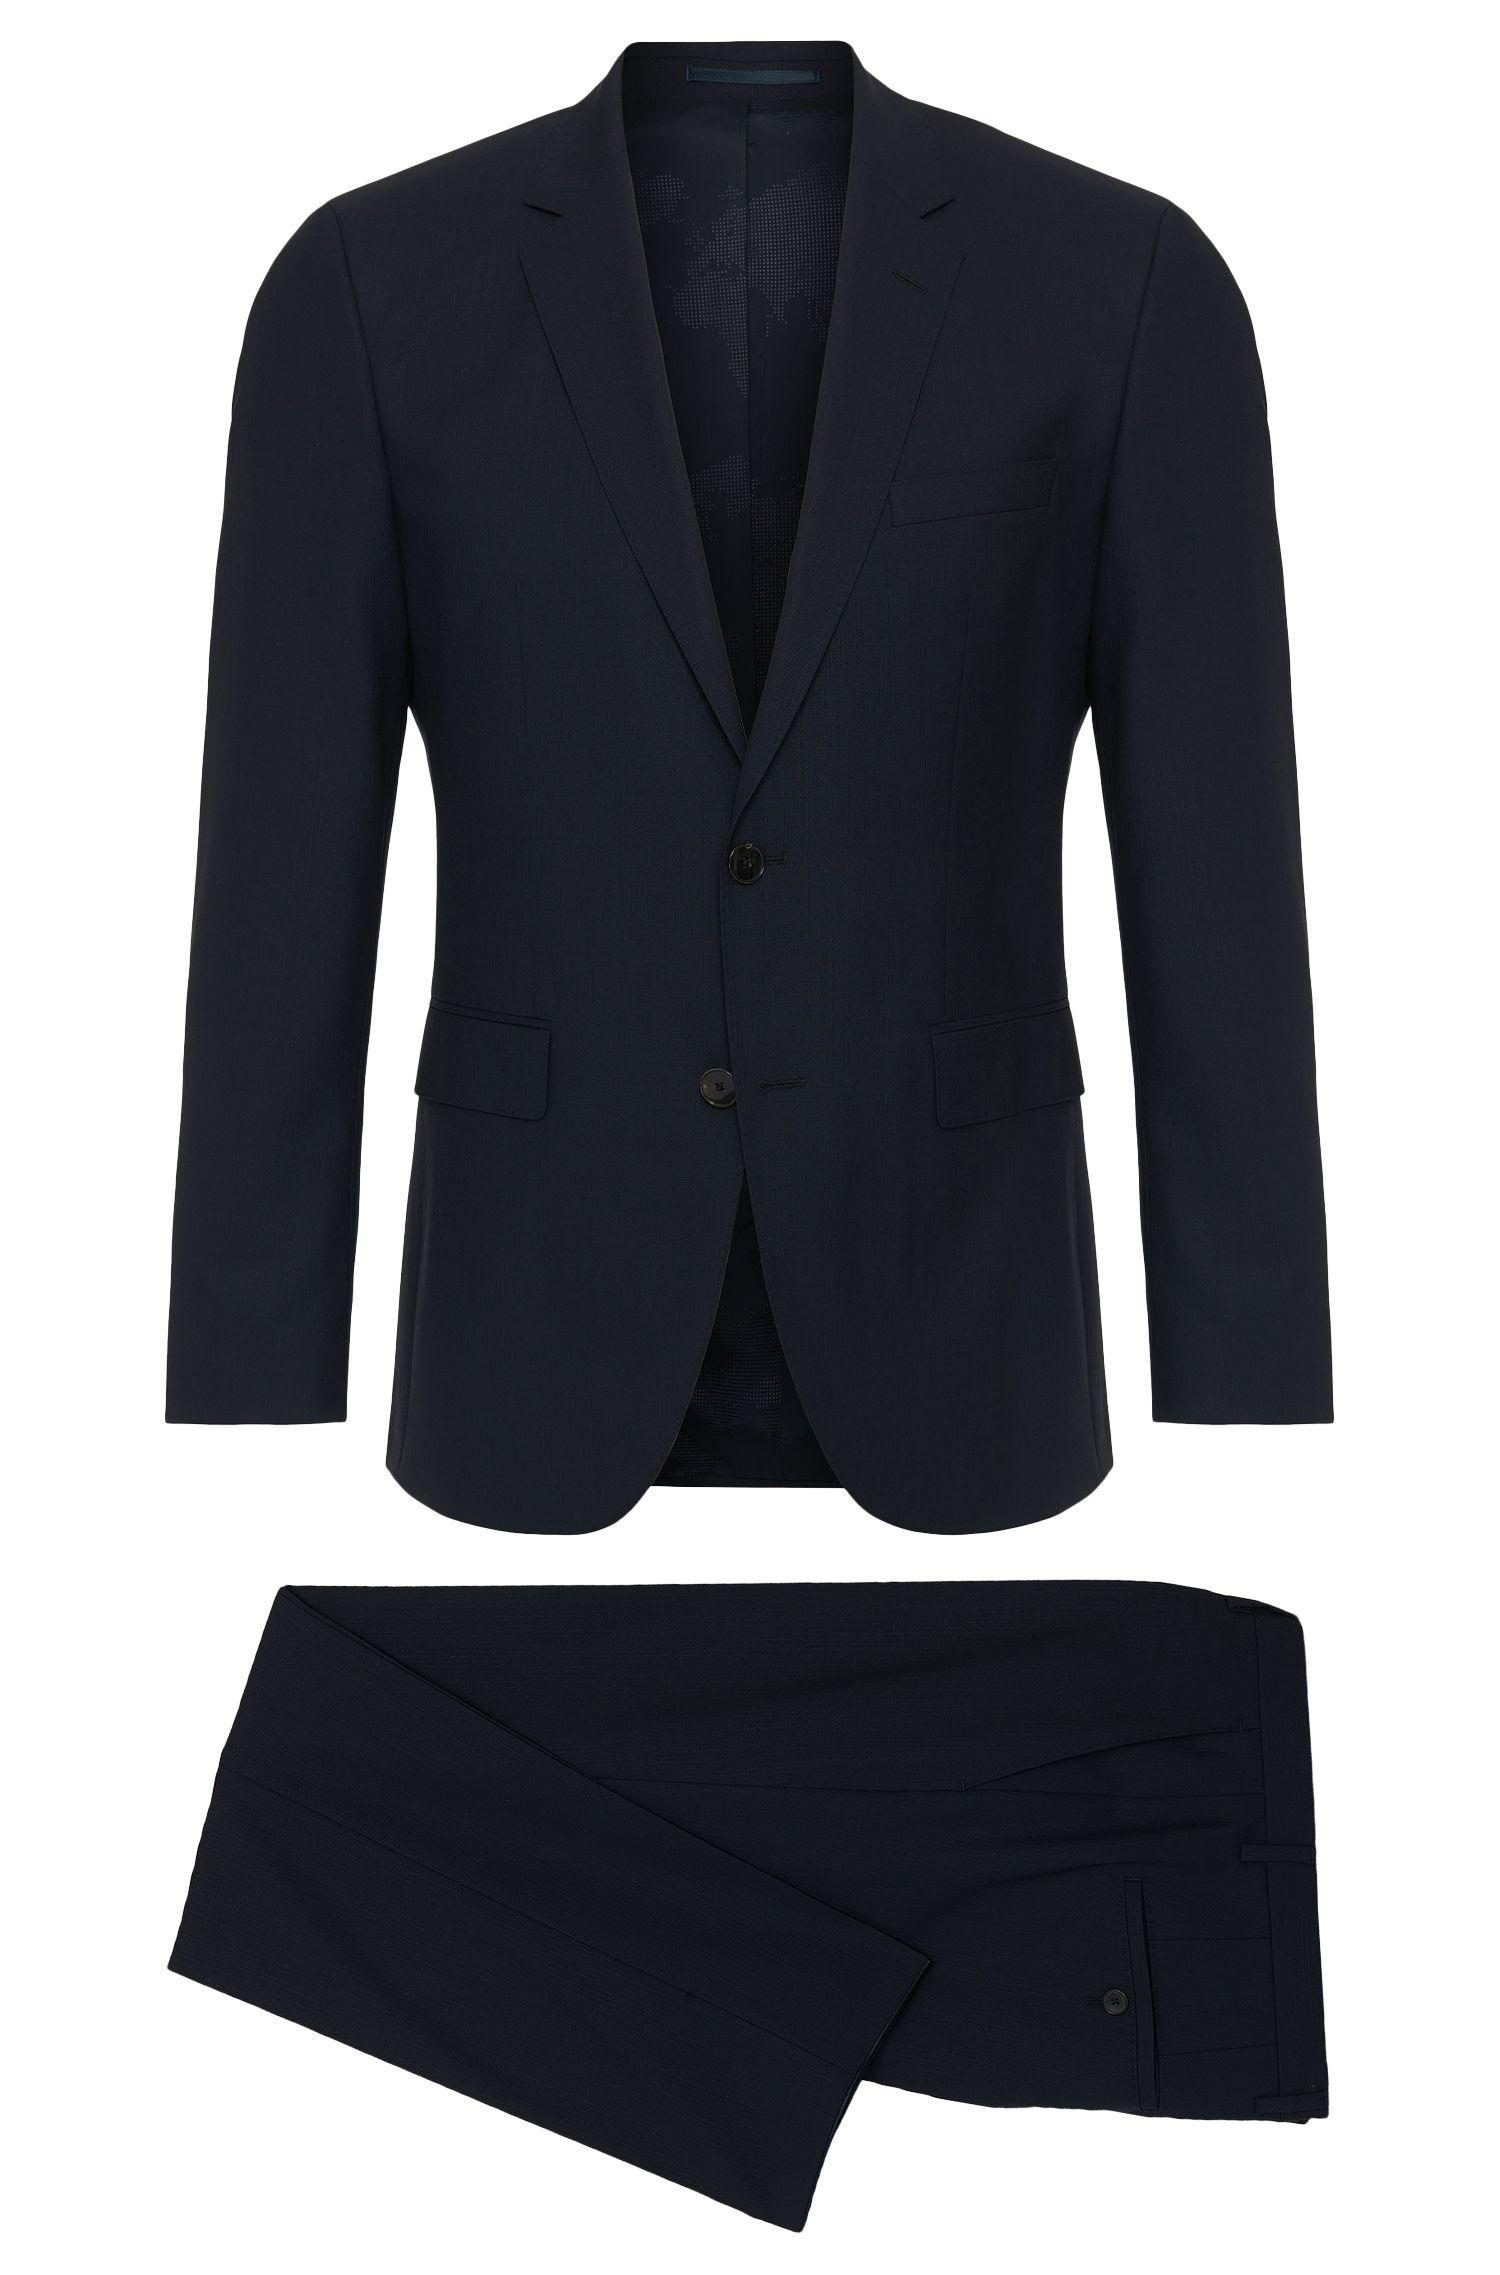 'Jets/Lenon' | Regular Fit, Traveler Super 110 Virgin Wool Suit